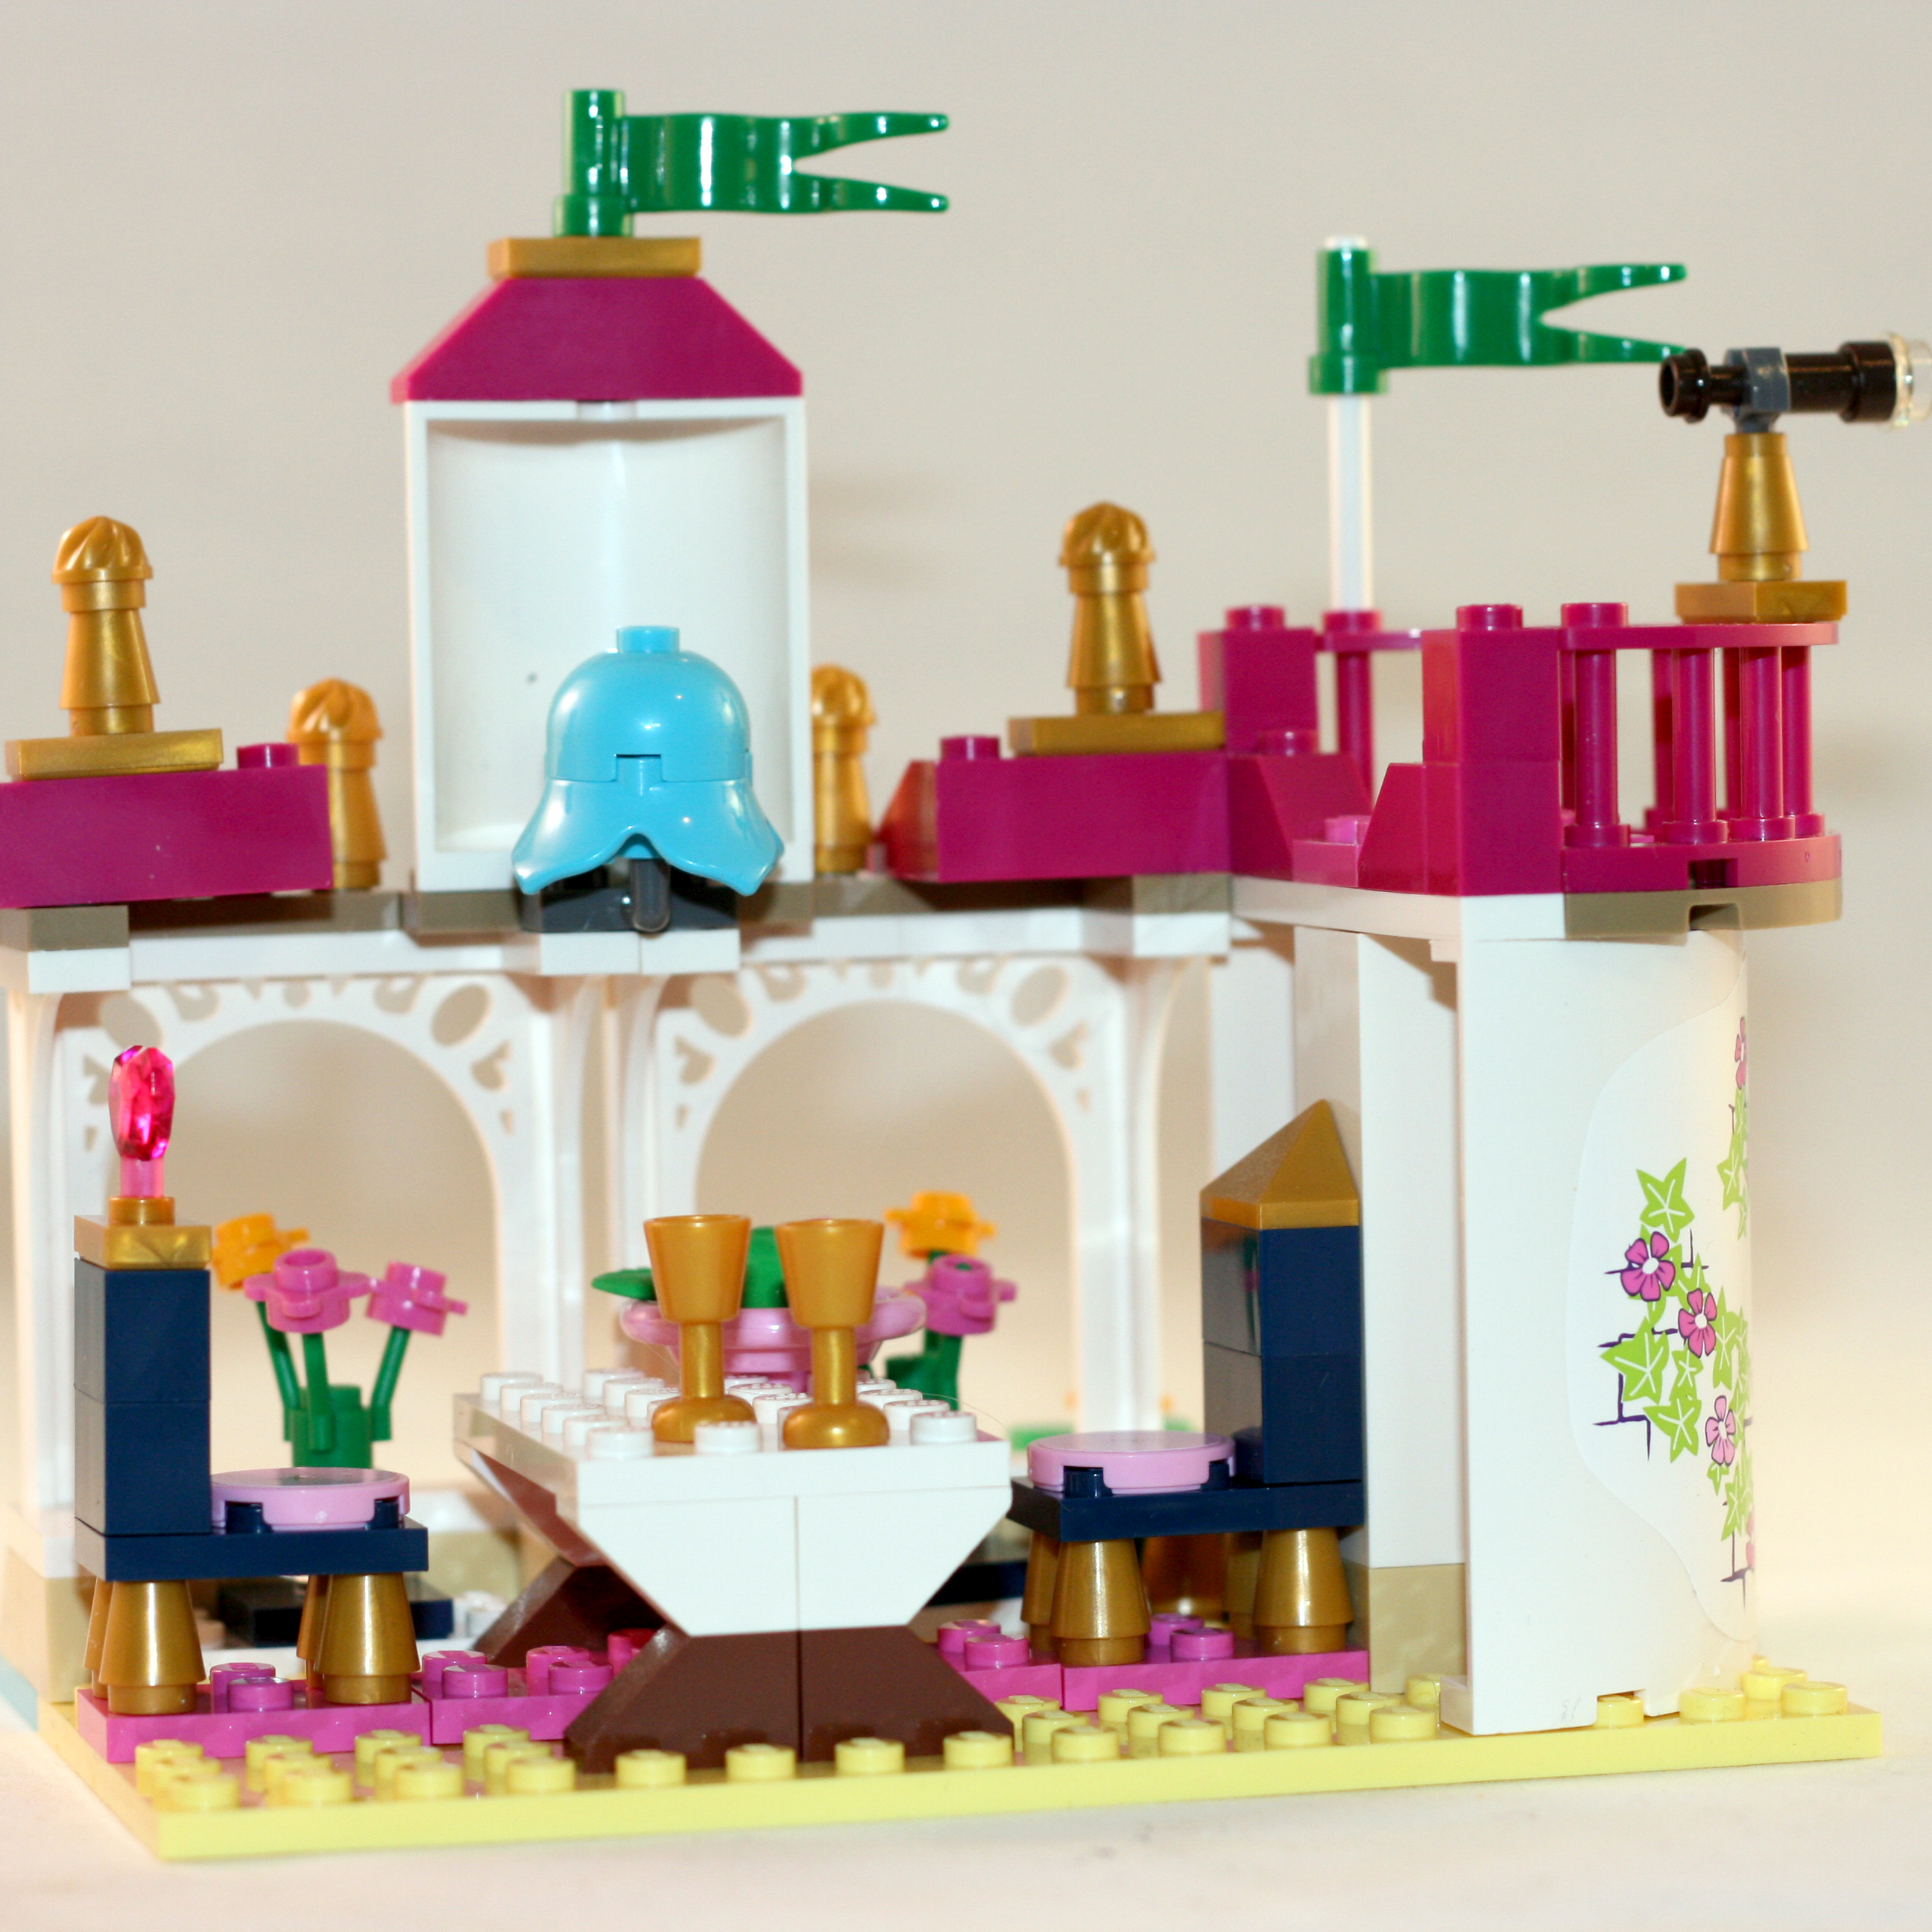 LEGO_Ariel_Building_2